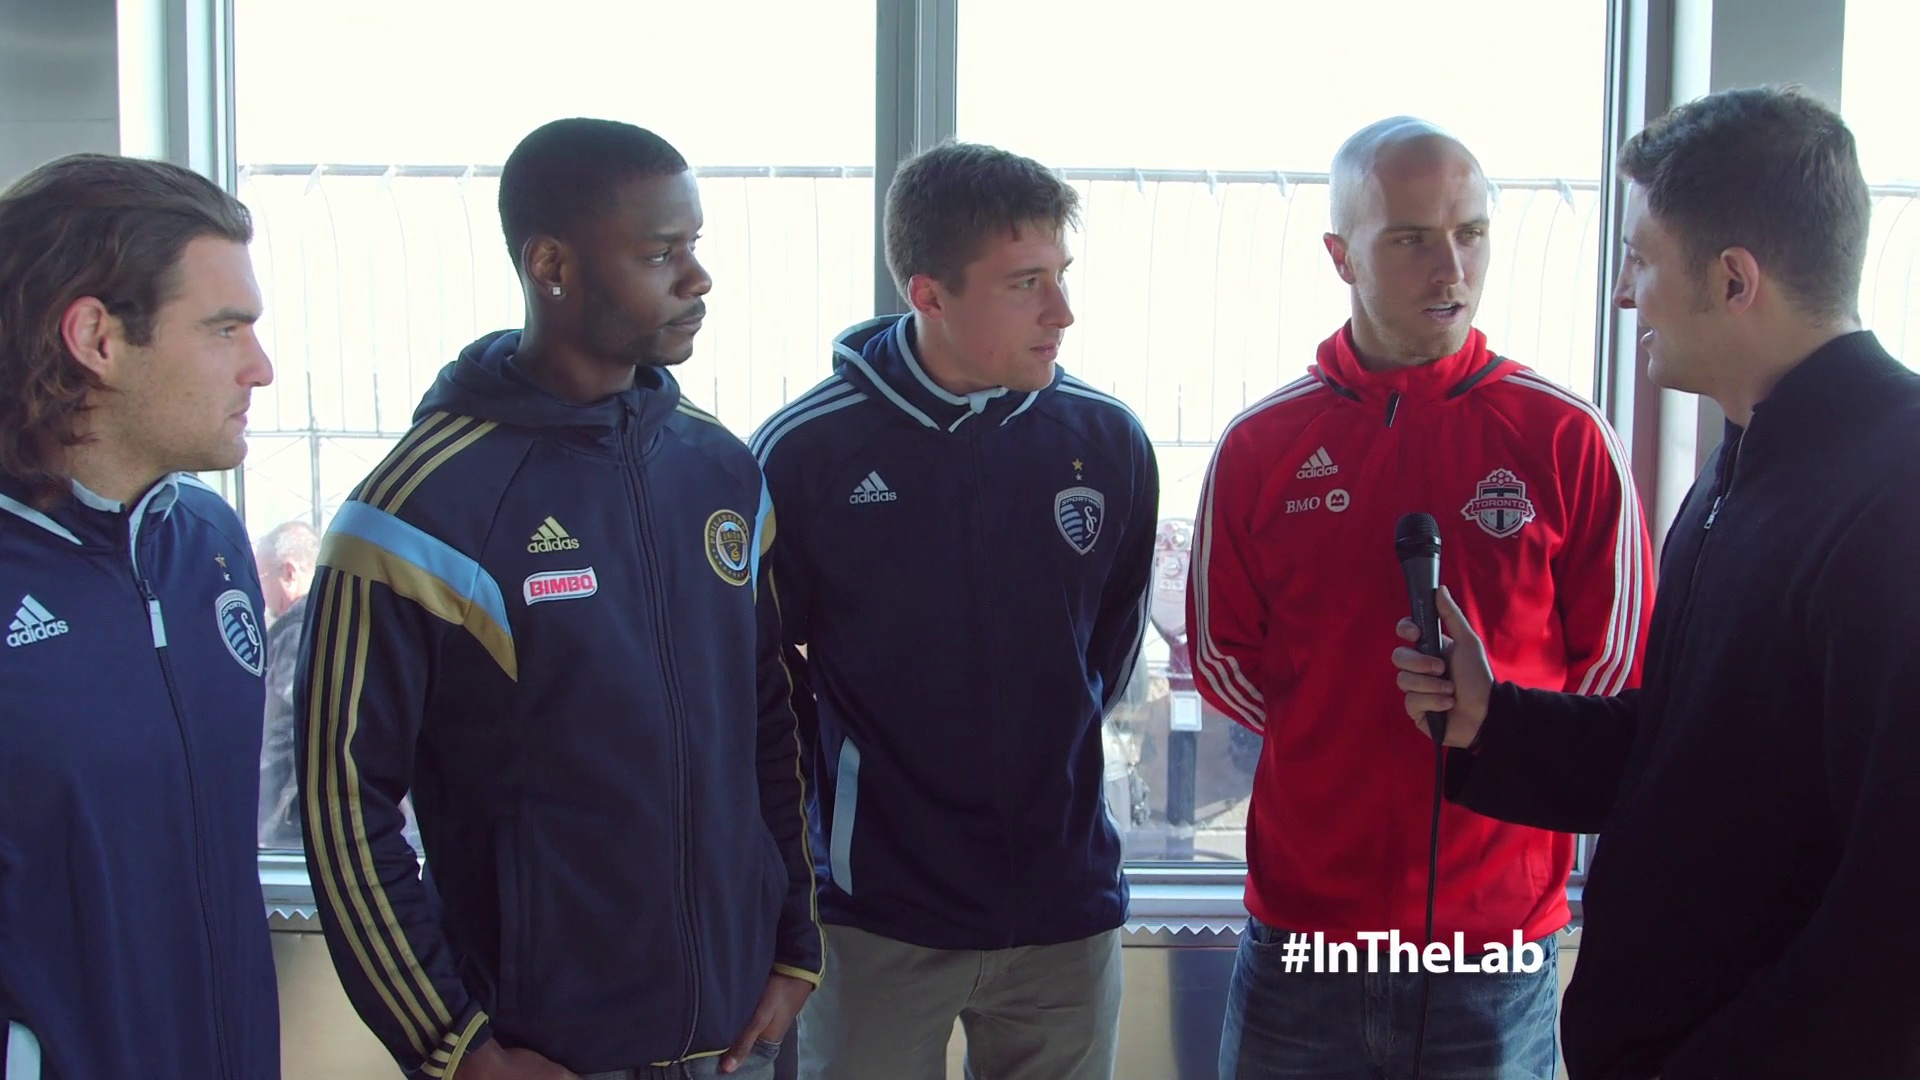 MLS Soccer Stars Bradley, Edu, Zusi & Besler #InTheLab